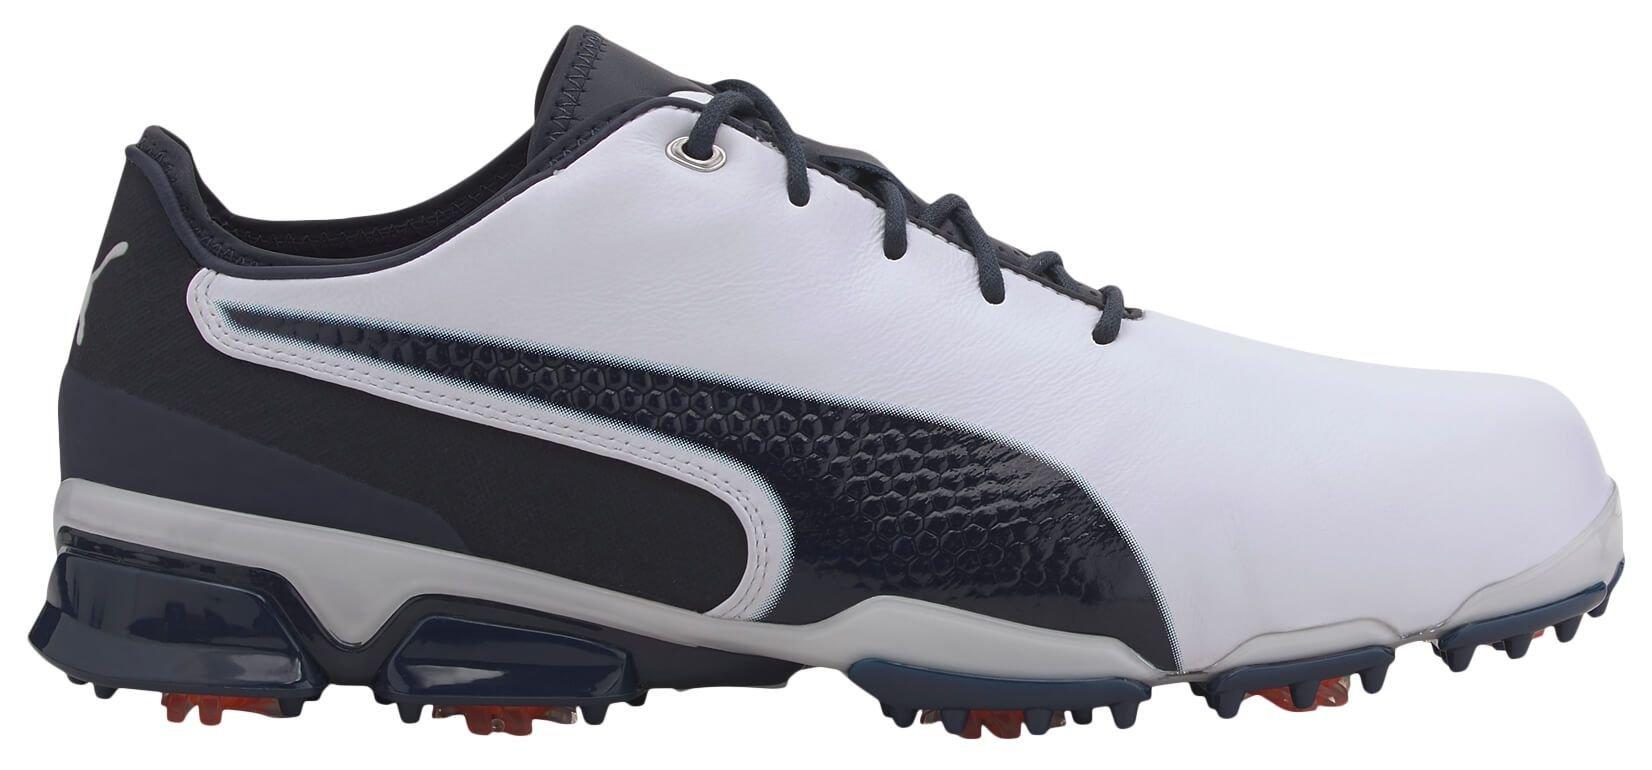 Puma IGNITE PROADAPT Golf Shoes - White/Peacoat